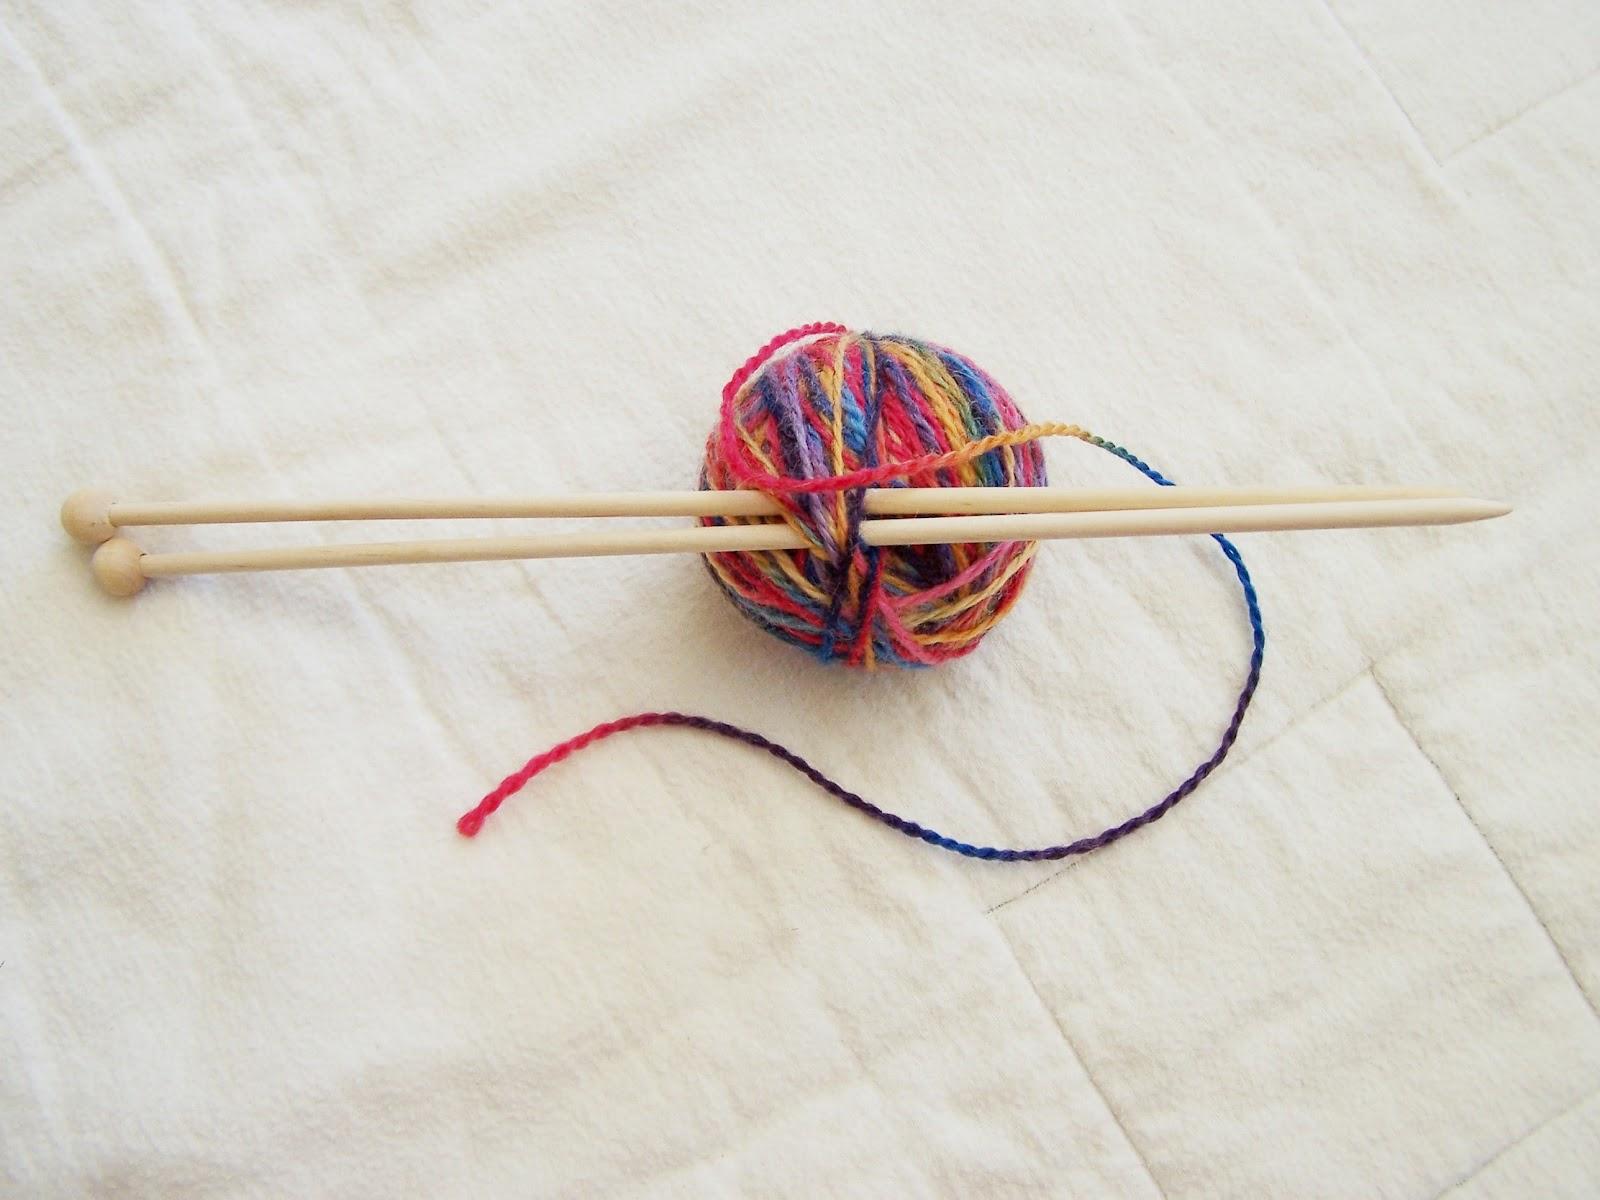 Knitting On 4 Needles : Madebyjoey making knitting needles